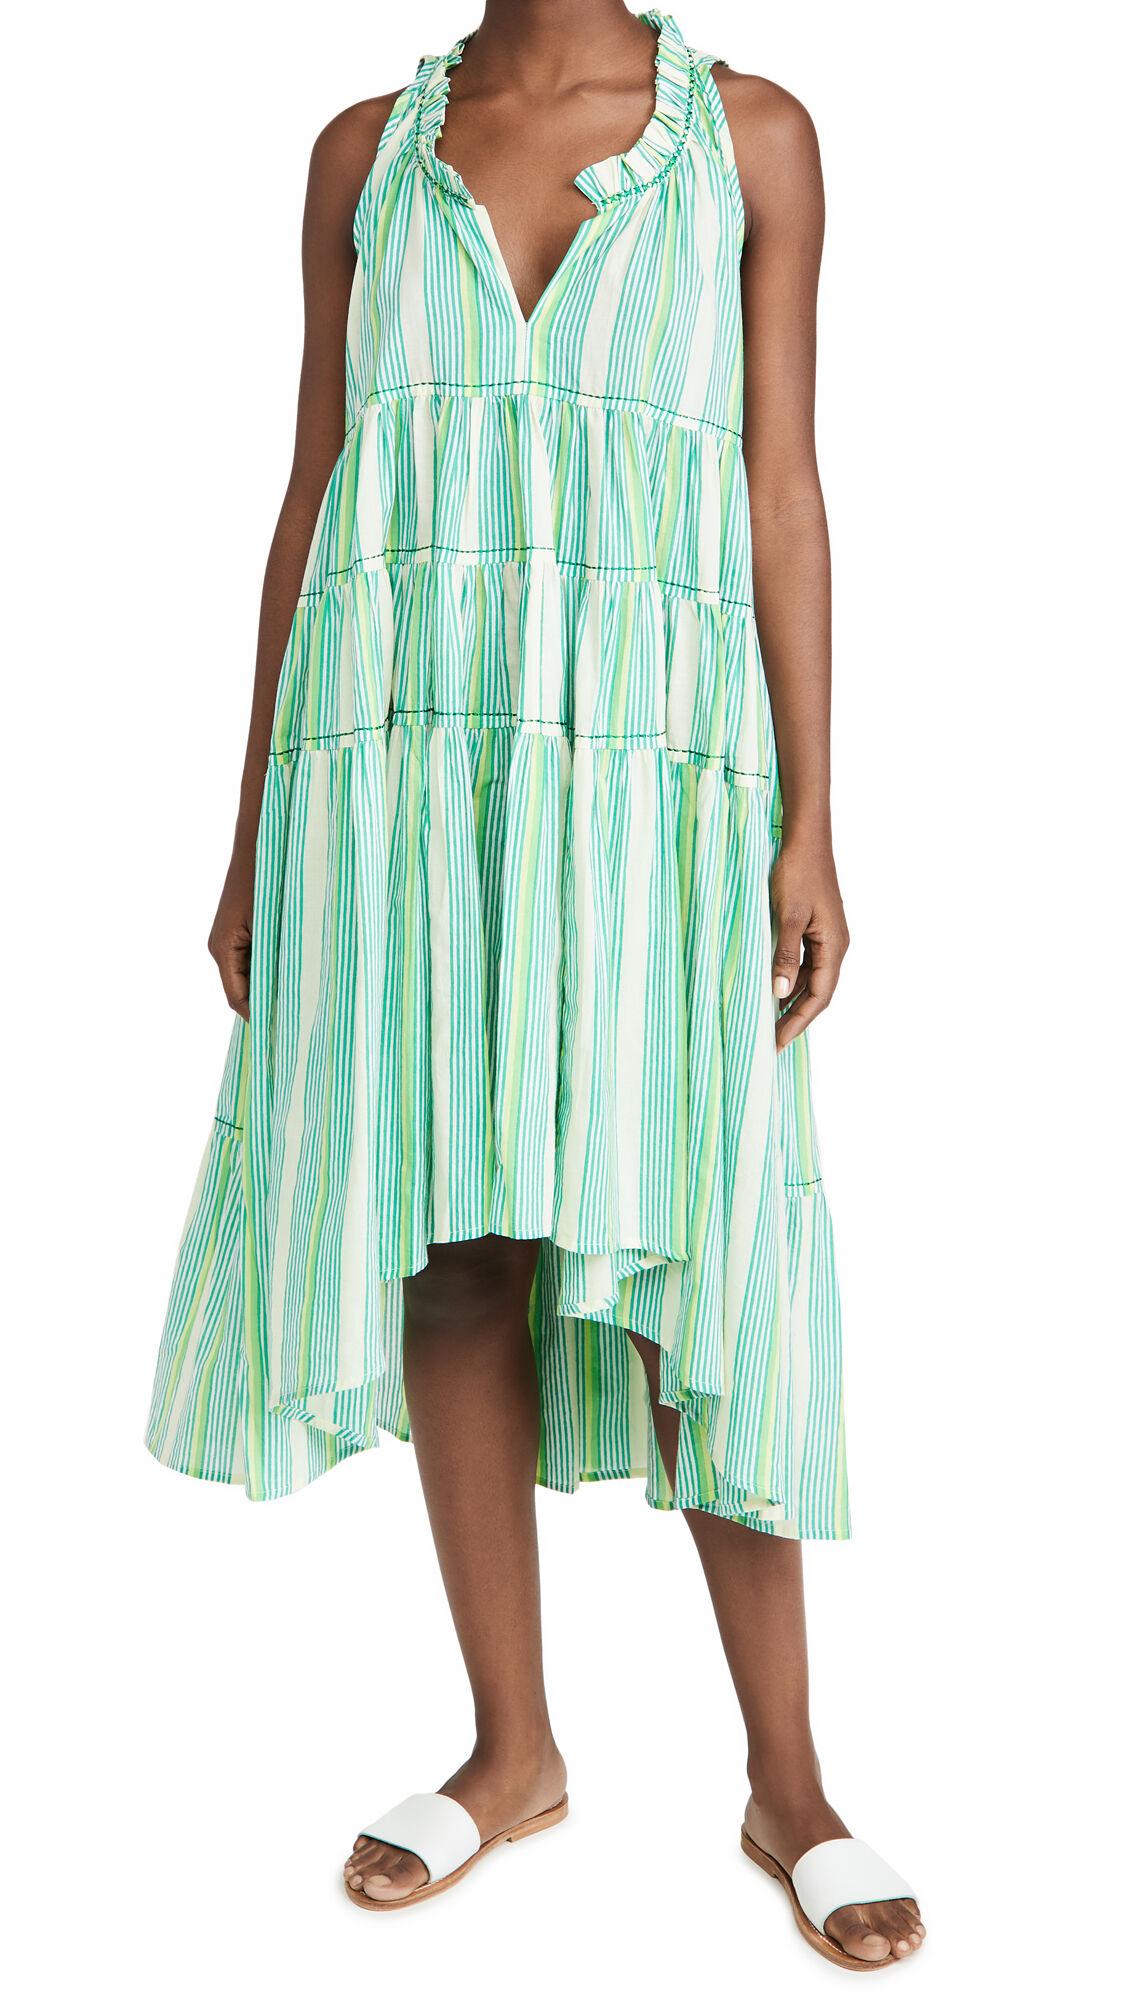 Ro's Garden Sasha Dress  - Nina Stripes Green - Size: Extra Large